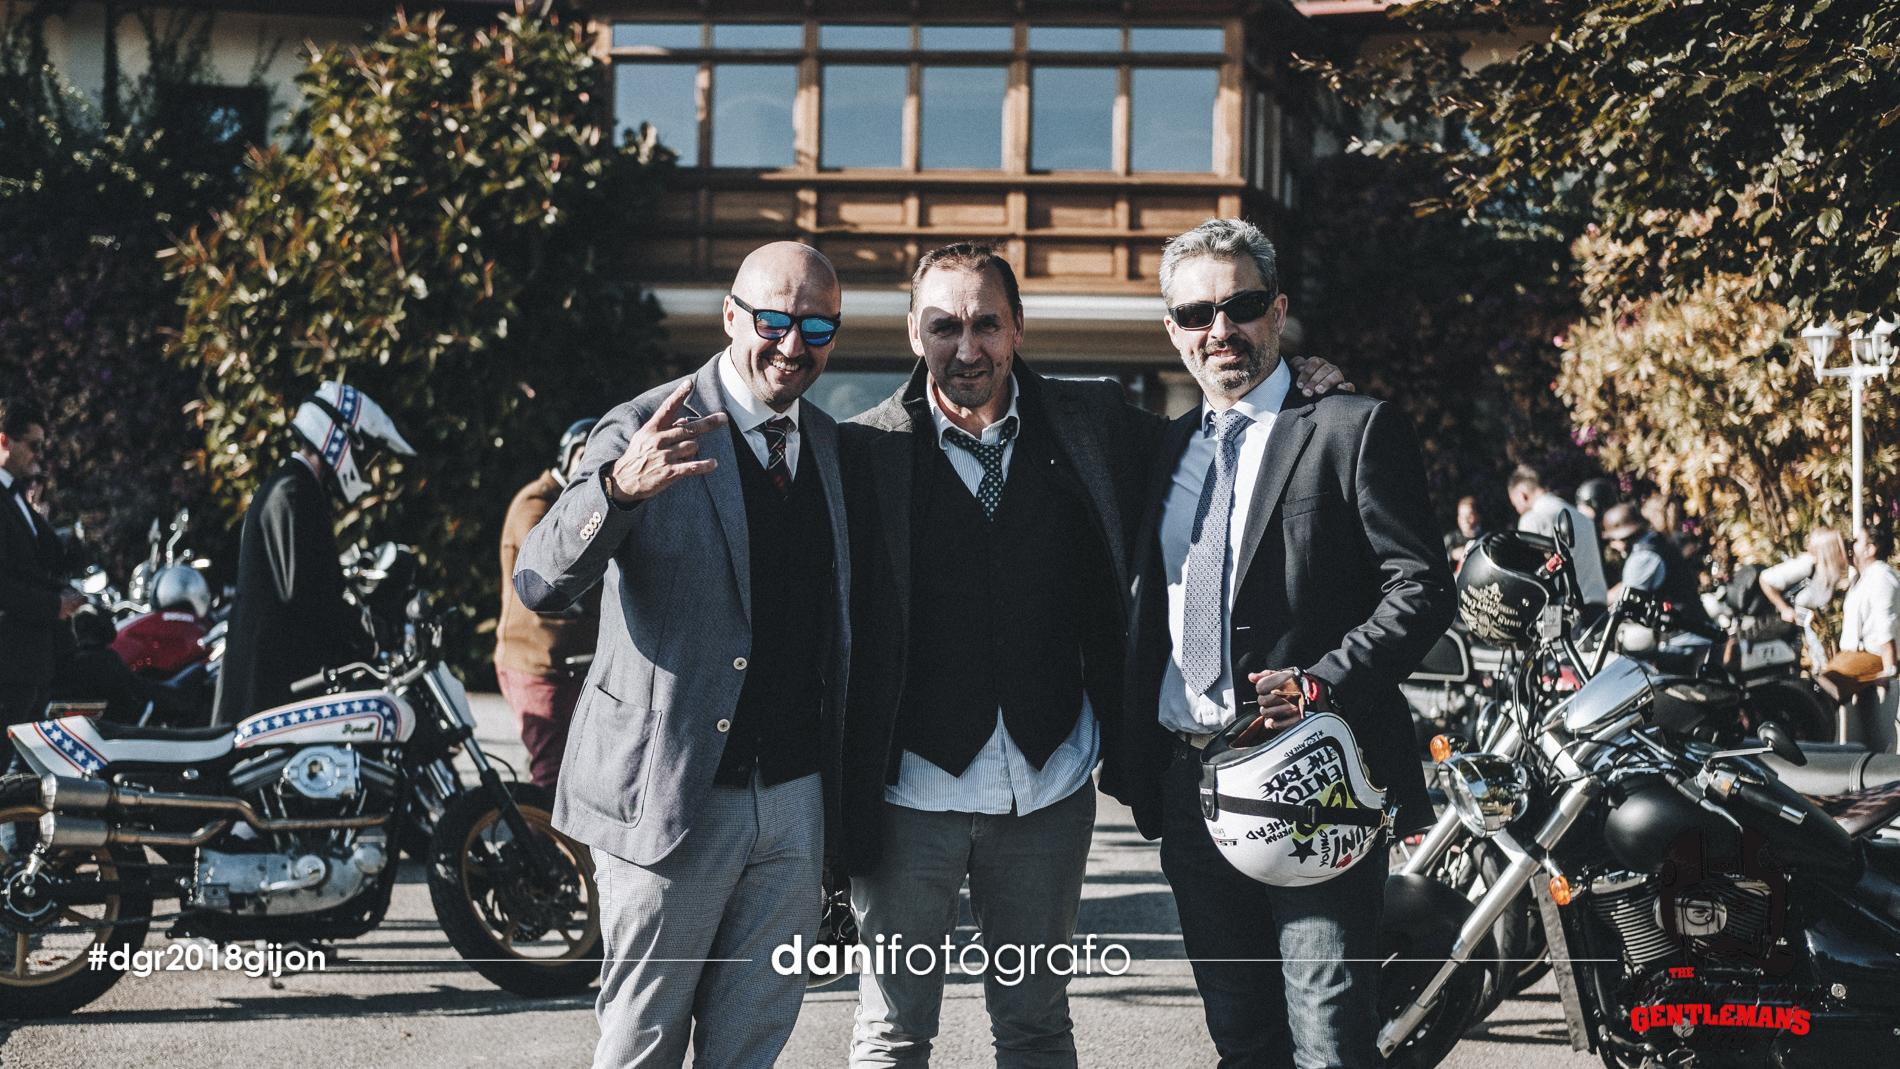 dgr 2018 gijon Distinguished Gentleman's Ride